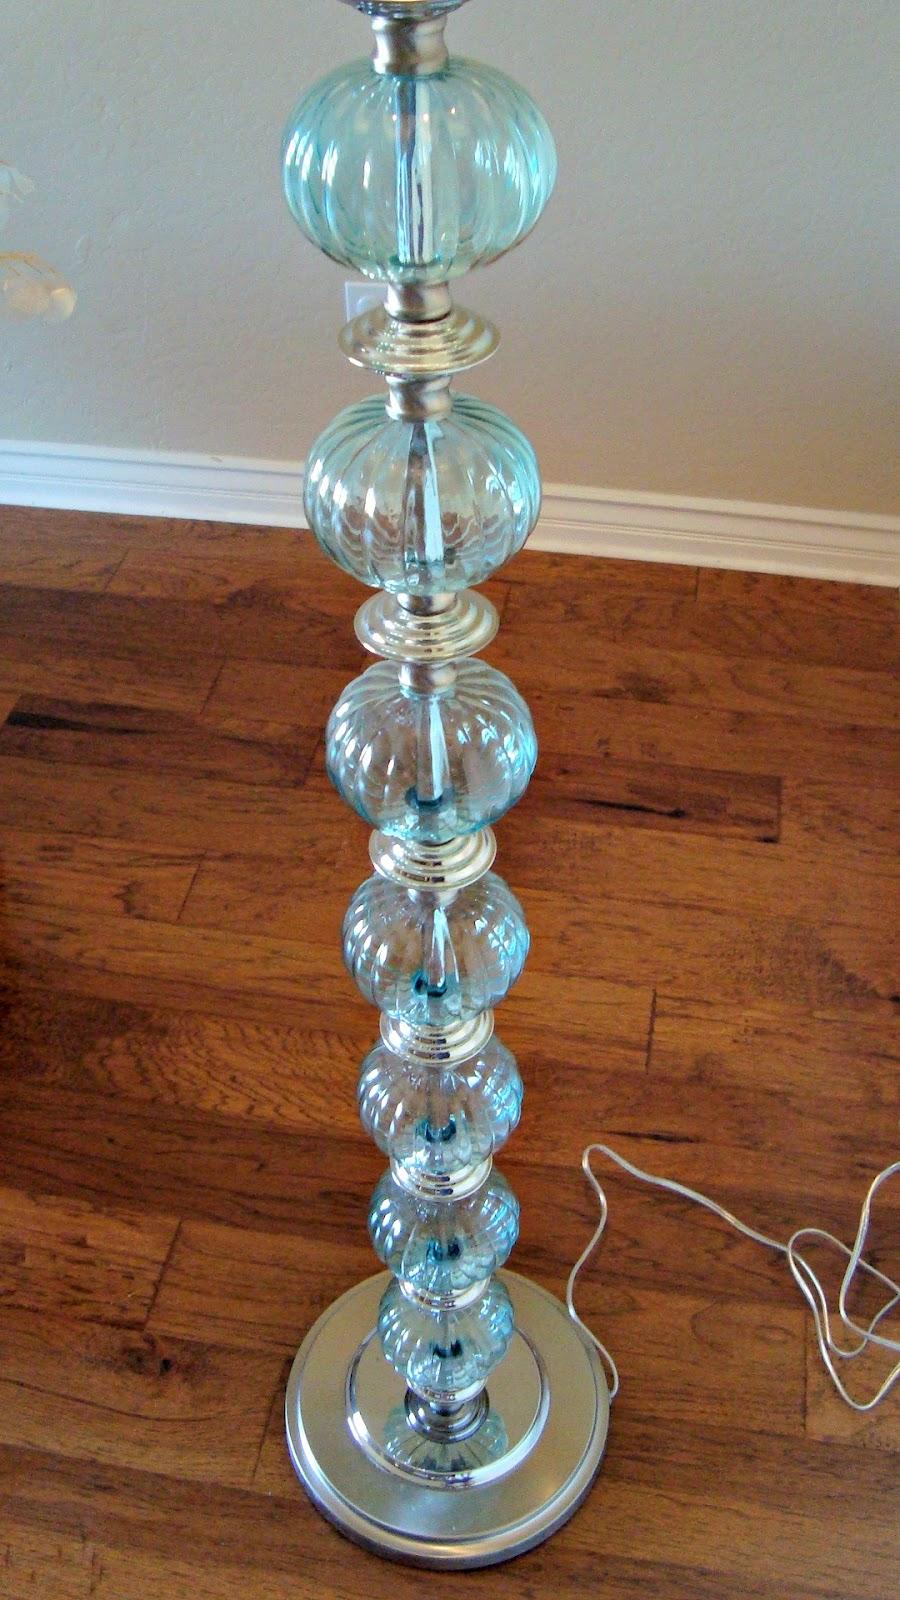 Christine's Favorite Things: Aqua Glass Floor Lamp